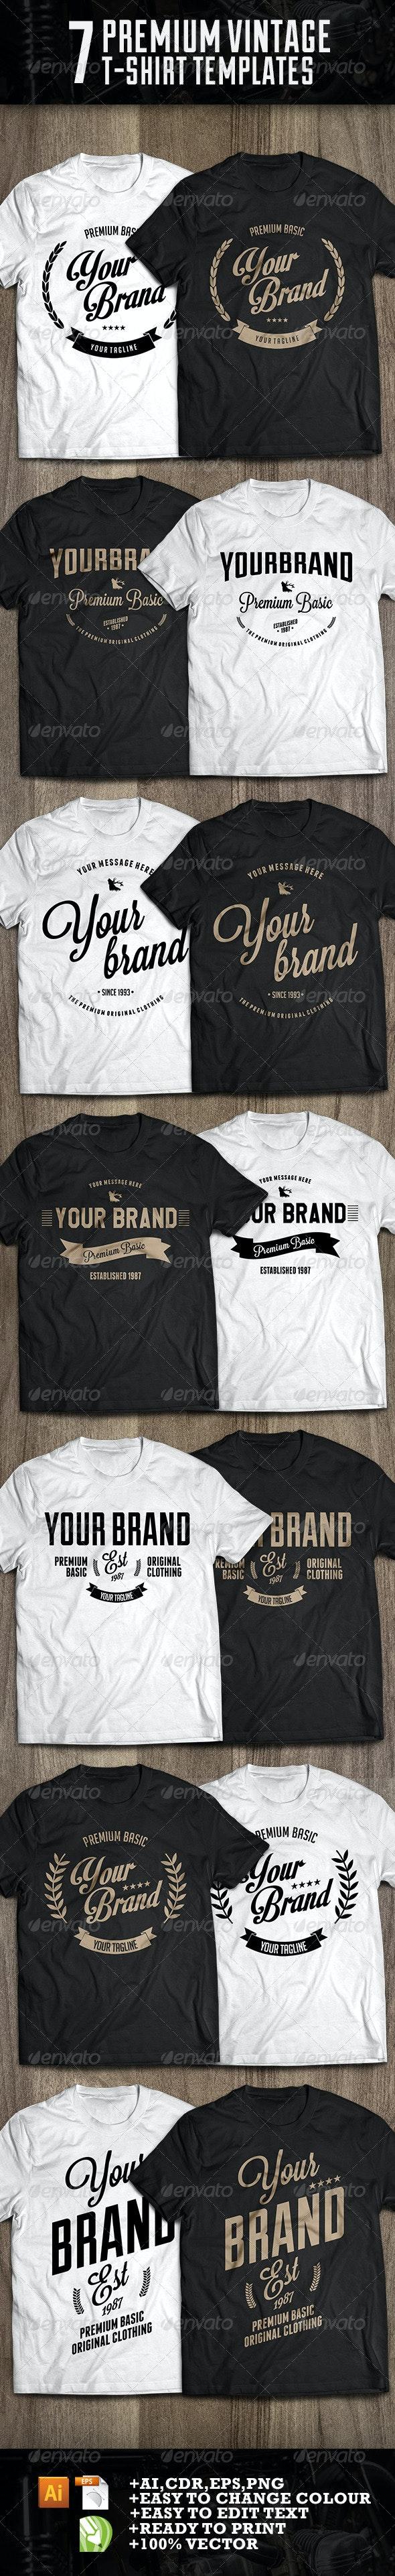 7 premium t-shirt template - Designs T-Shirts